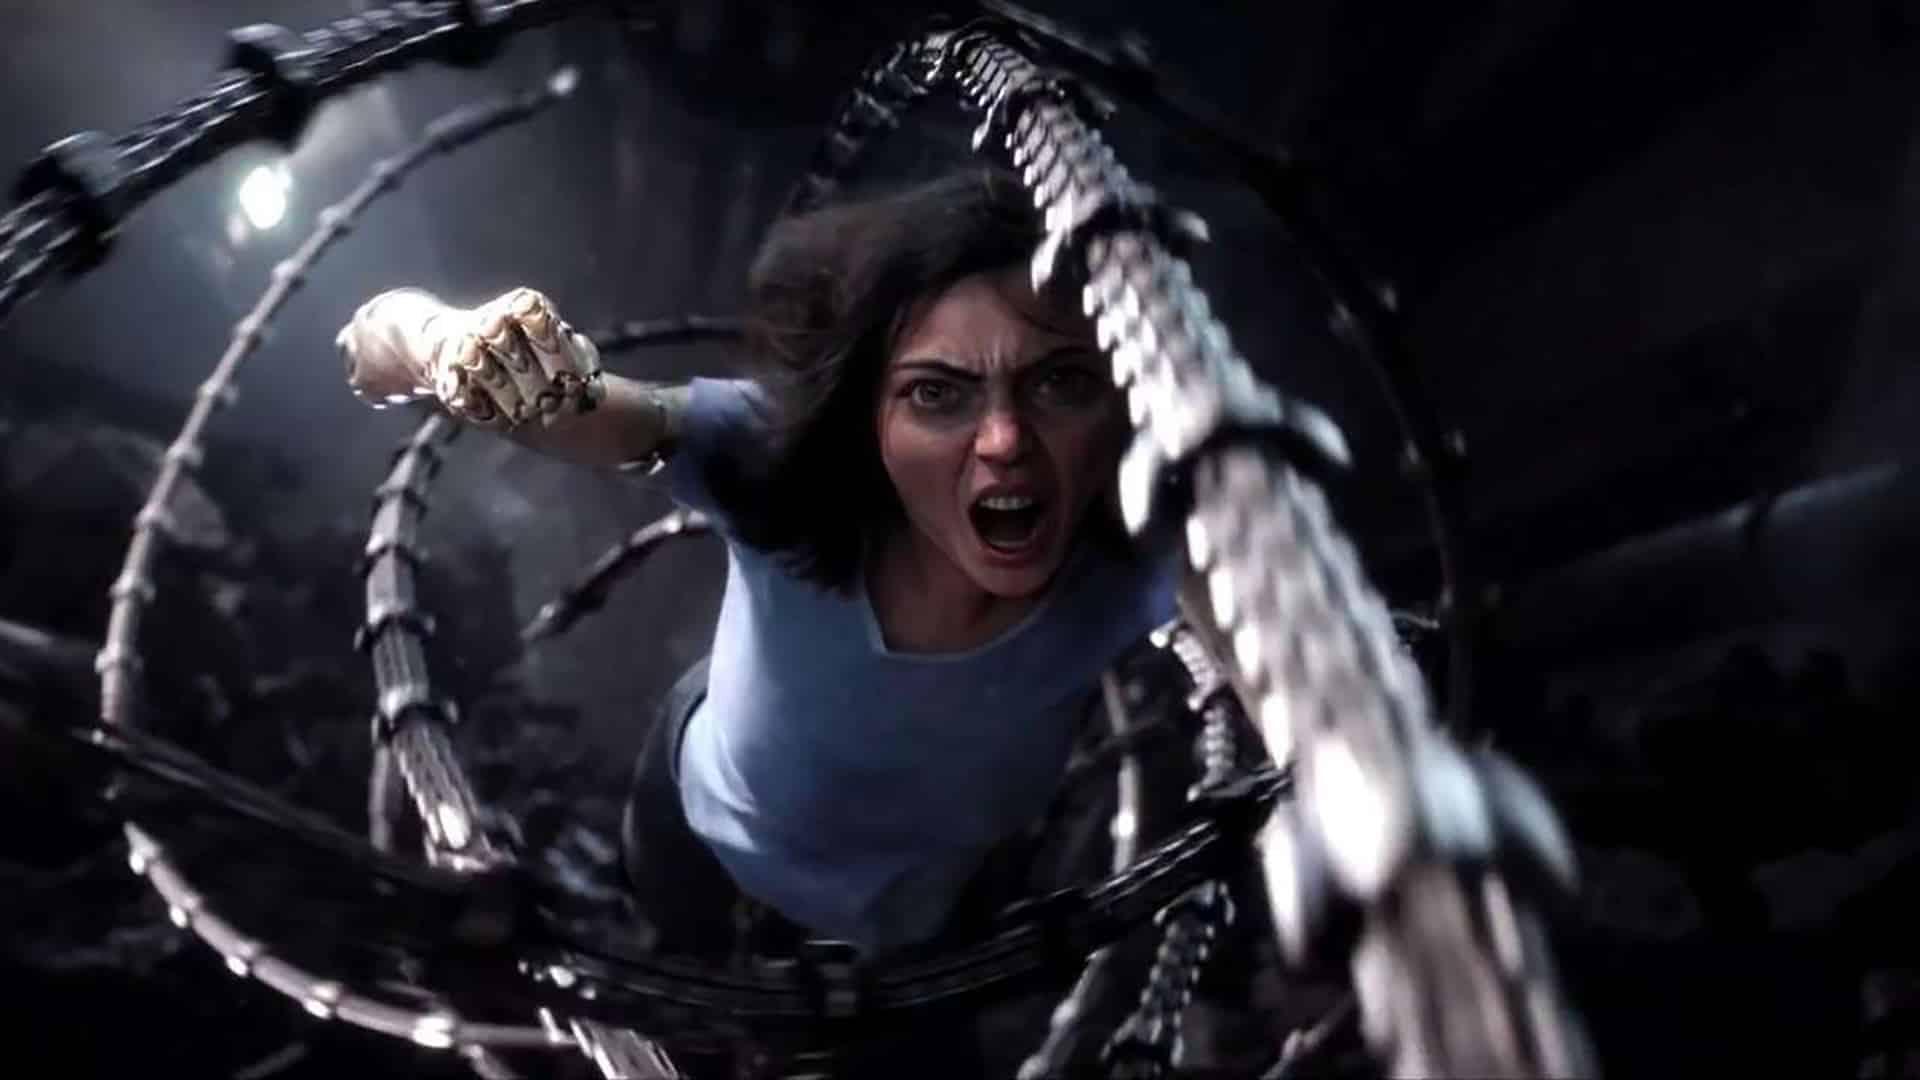 https://www.cinematographe.it/wp-content/uploads/2018/07/alita-battle-angel-the-predator-posticipati-fissata-uscita-death-on-nile-v3-320736.jpg